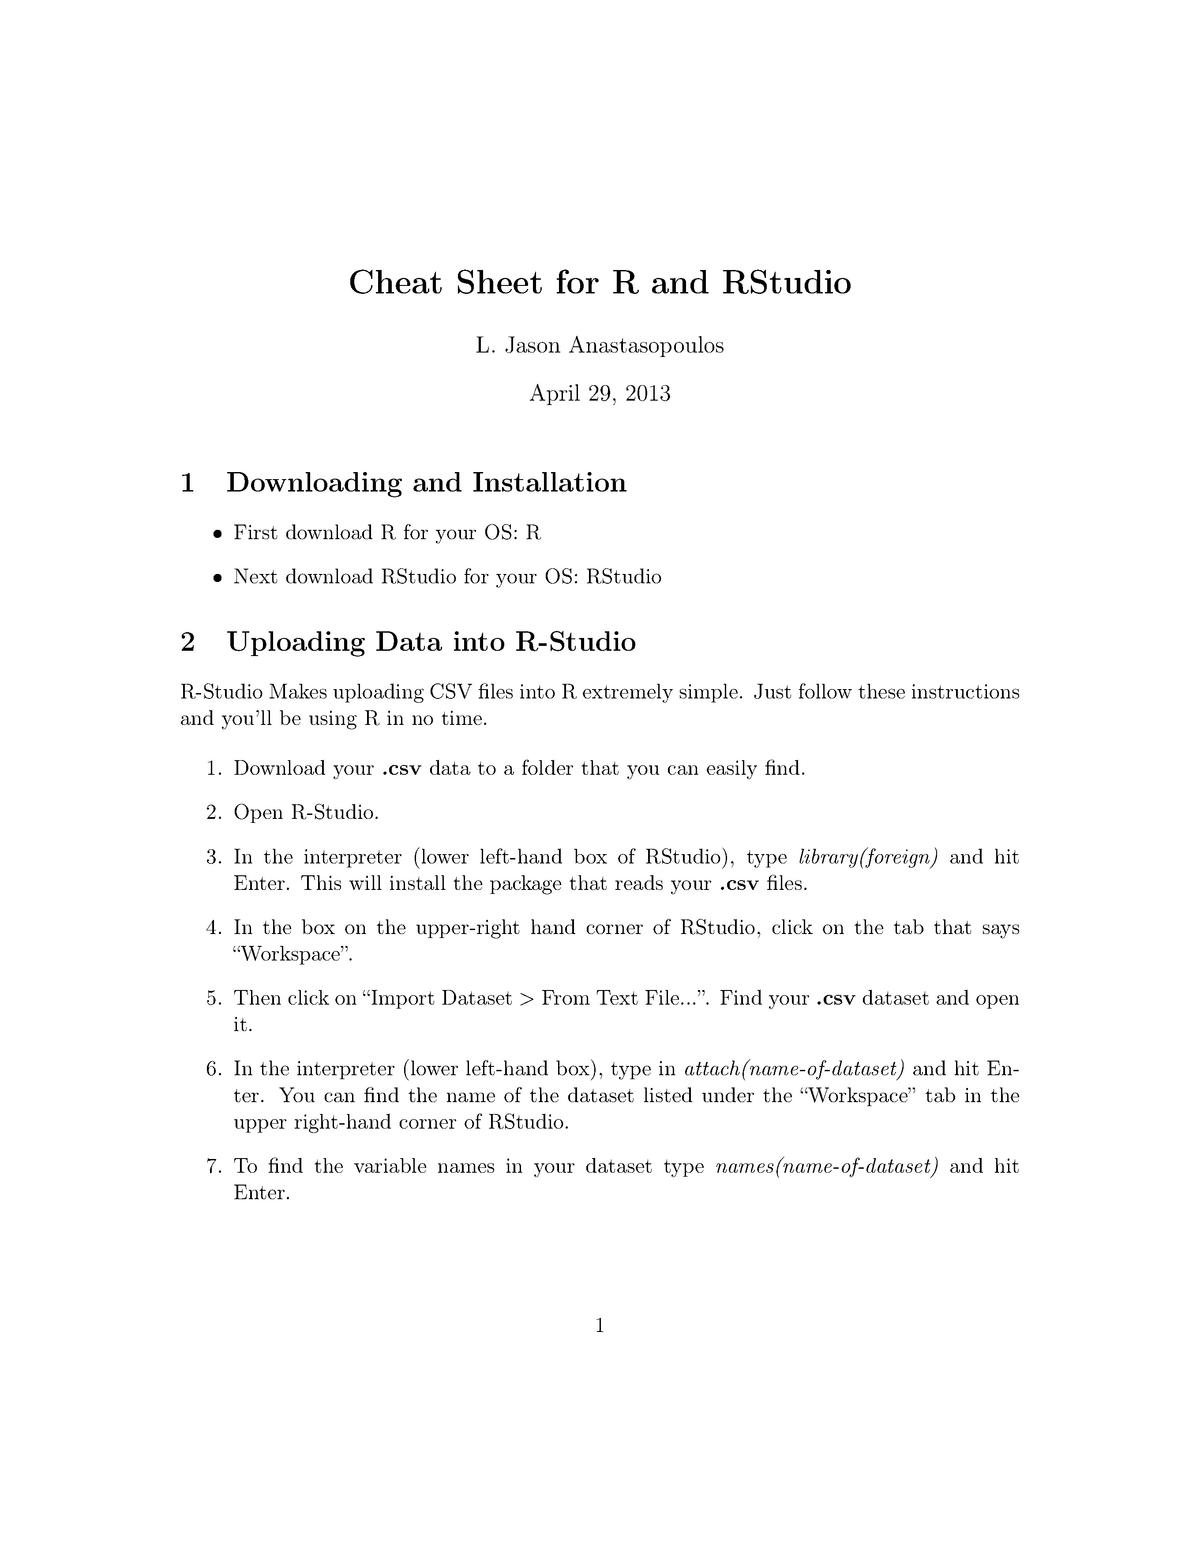 RStudio Cheat Sheet - MAS180: Introduction to Statistics - StuDocu